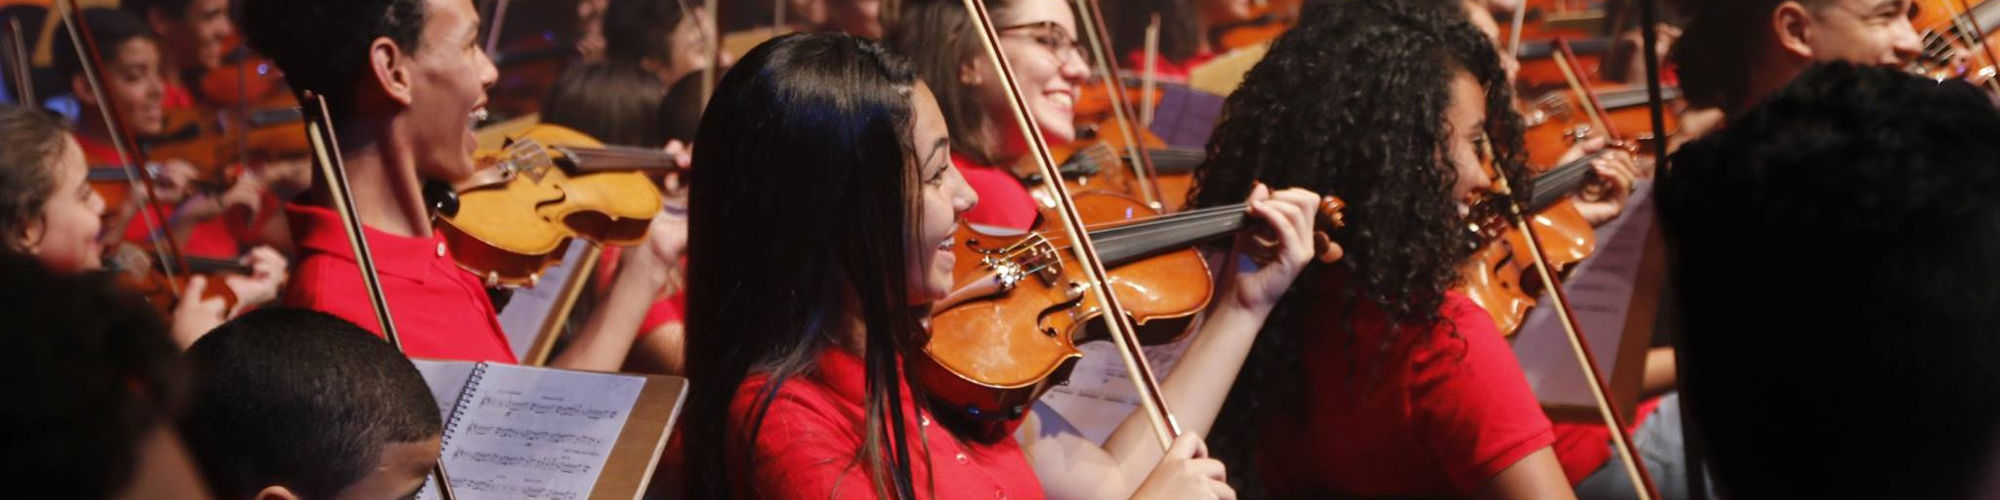 Projeto Locomotiva 10 anos: Orquestra infantojuvenil apresenta concerto gratuito na Unibes Cultural